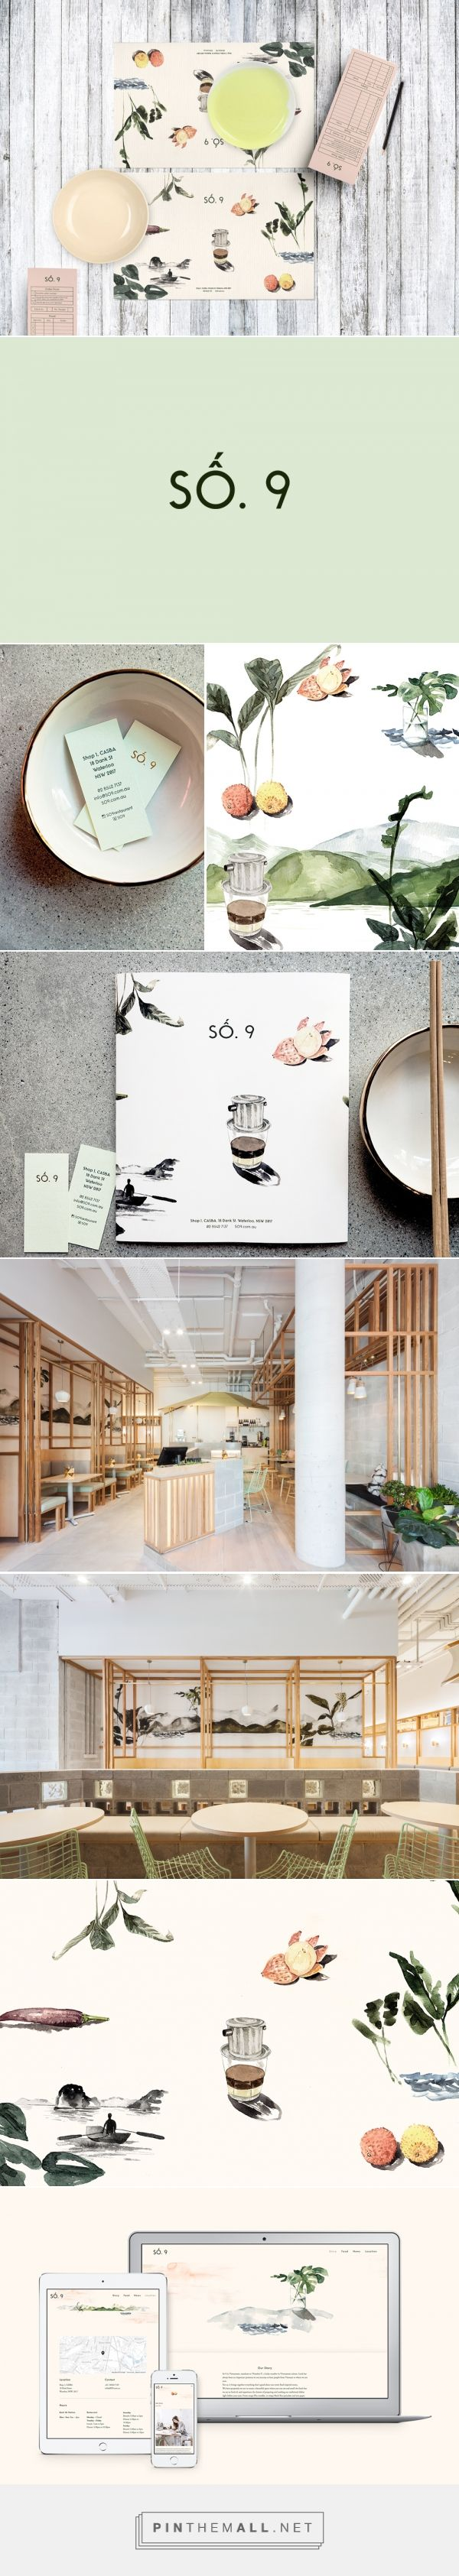 SO.9's Vietnamese Restaurant Branding by BrandWorks Studio   Fivestar Branding Agency – Design and Branding Agency & Curated Inspiration Gallery